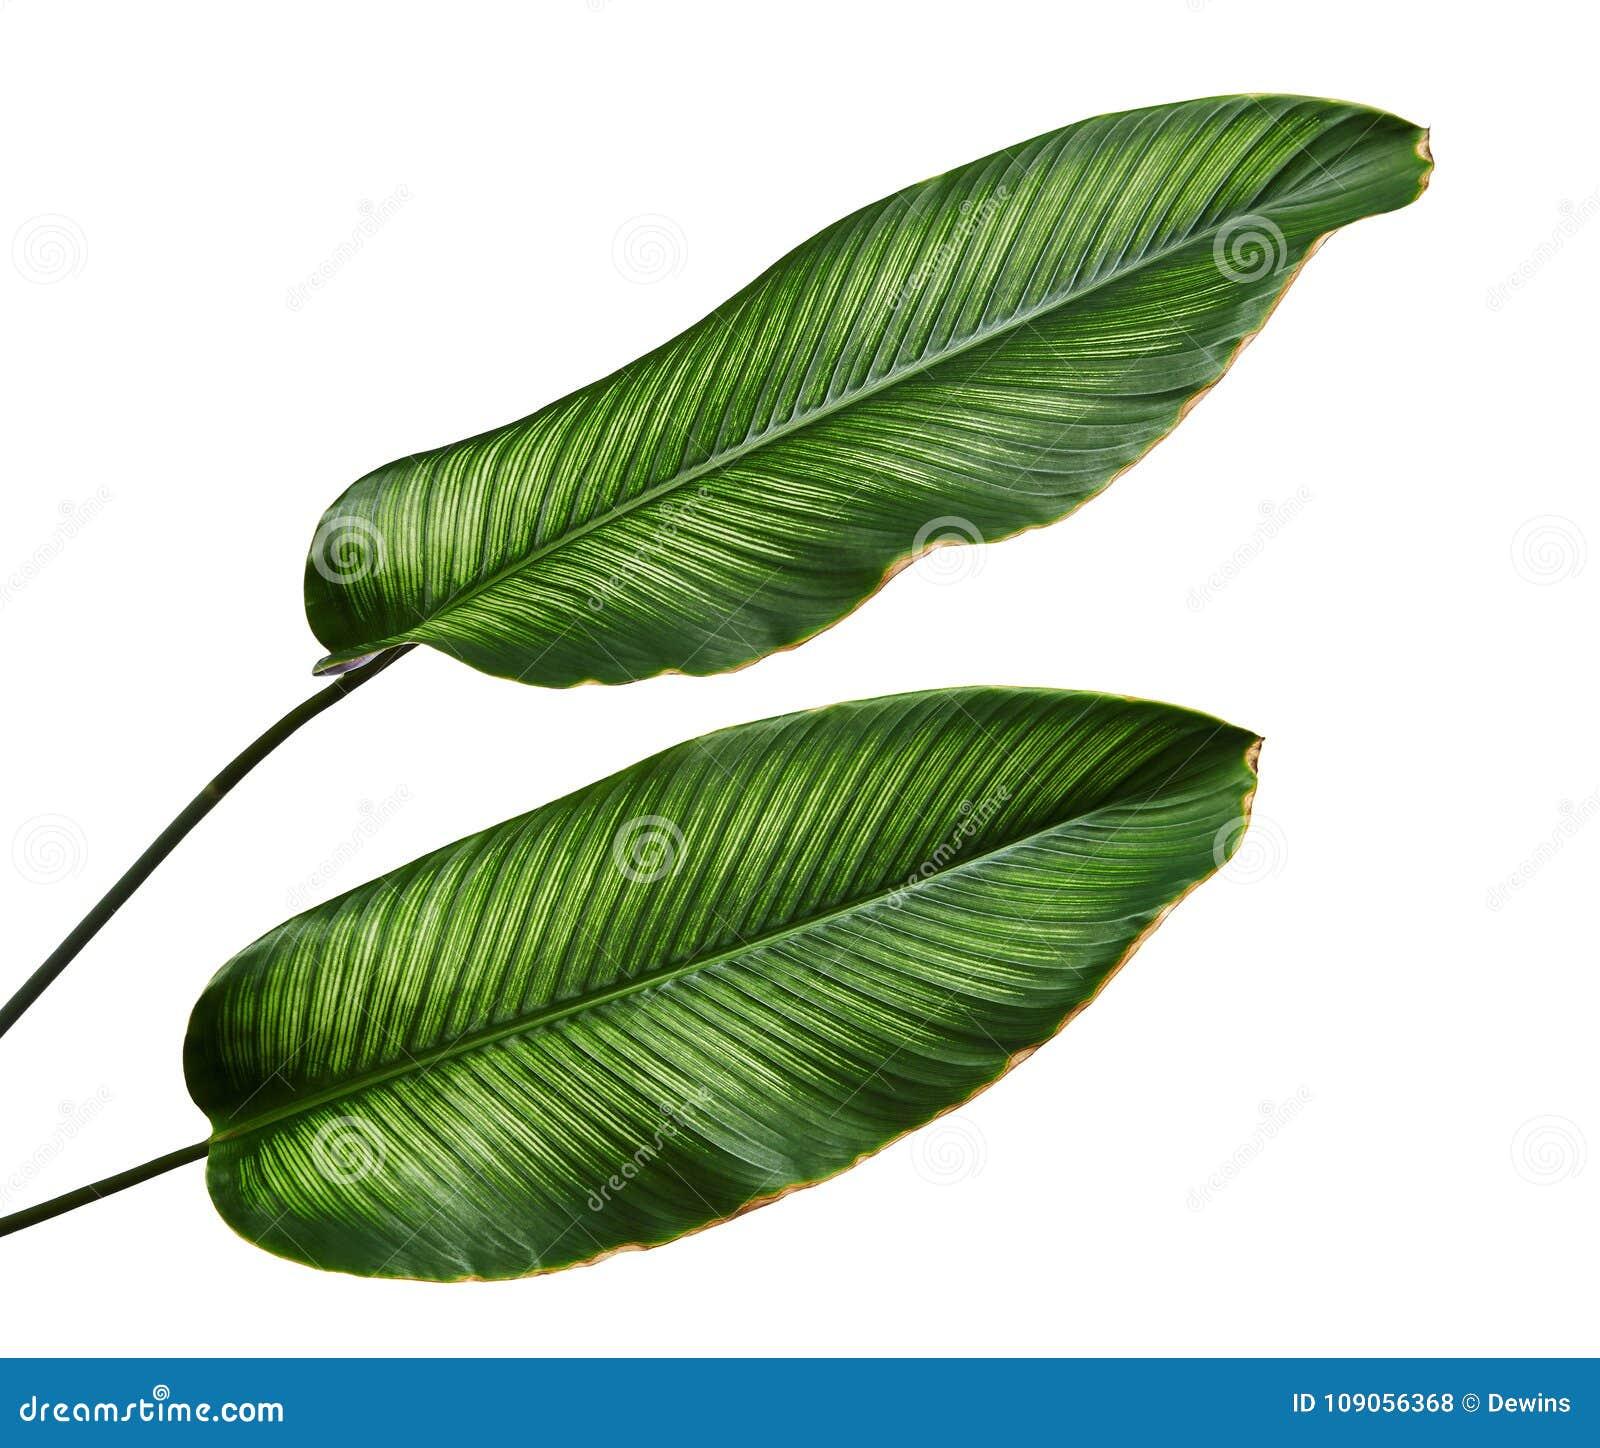 Calathea ornata Pin-stripe Calathea leaves, Tropical foliage isolated on white background, with clipping path